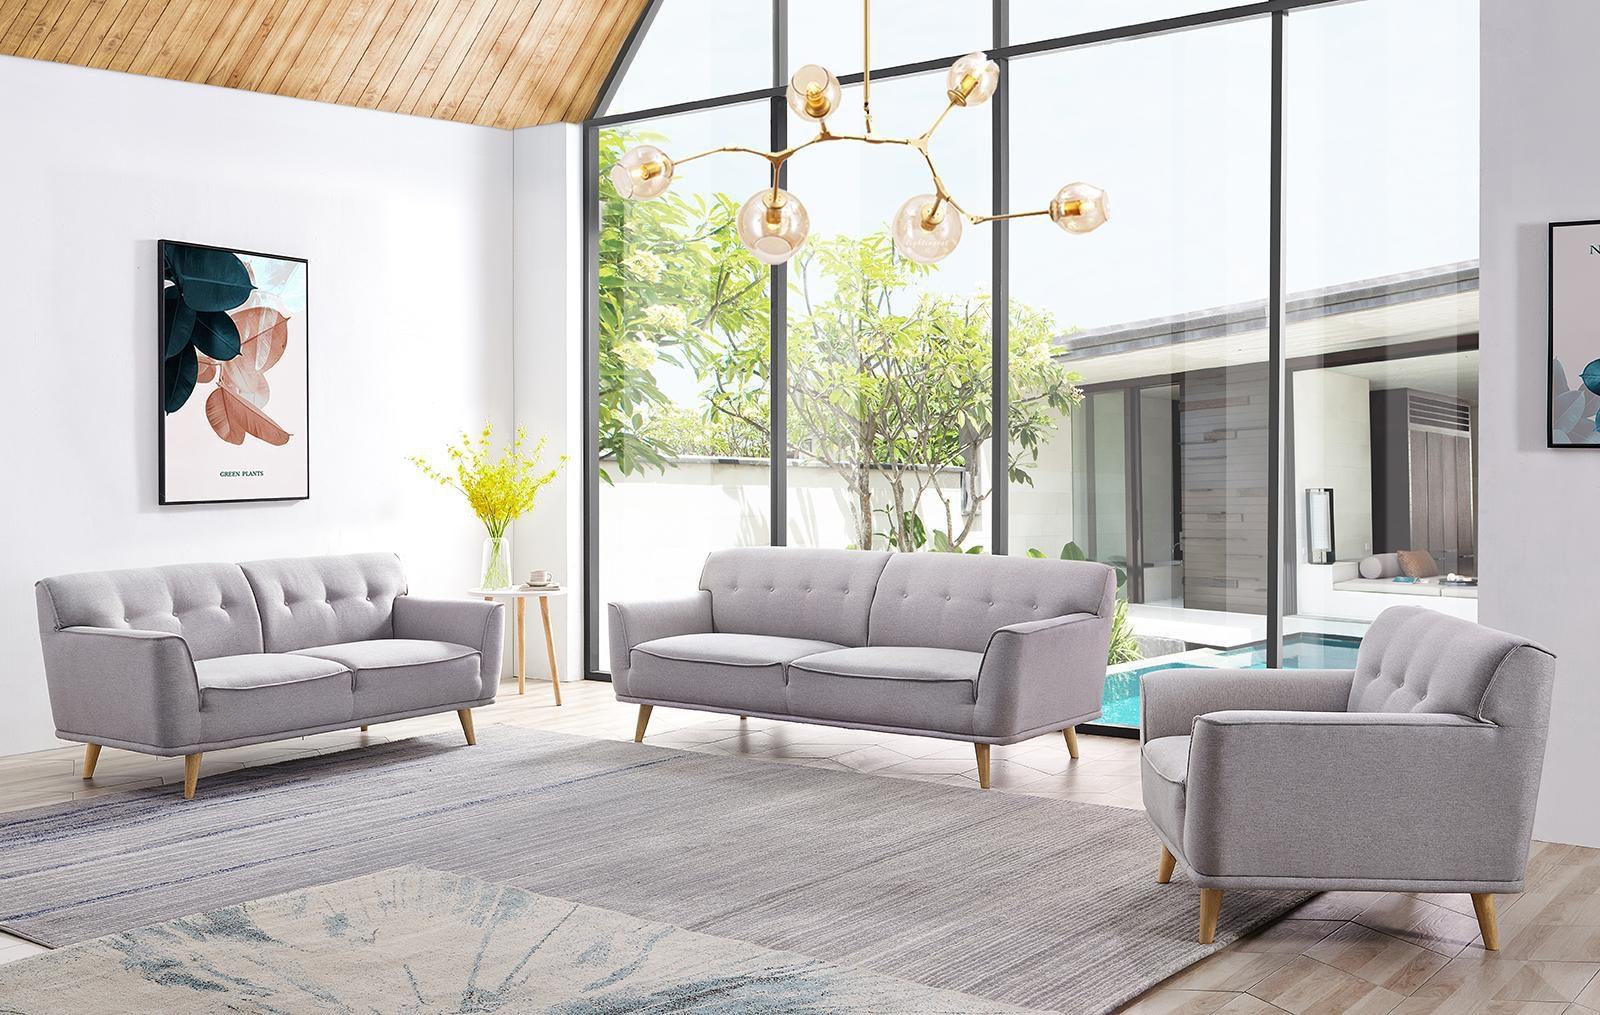 Набор мягкой мебели Florena 5281 BEIGE(GRAY)